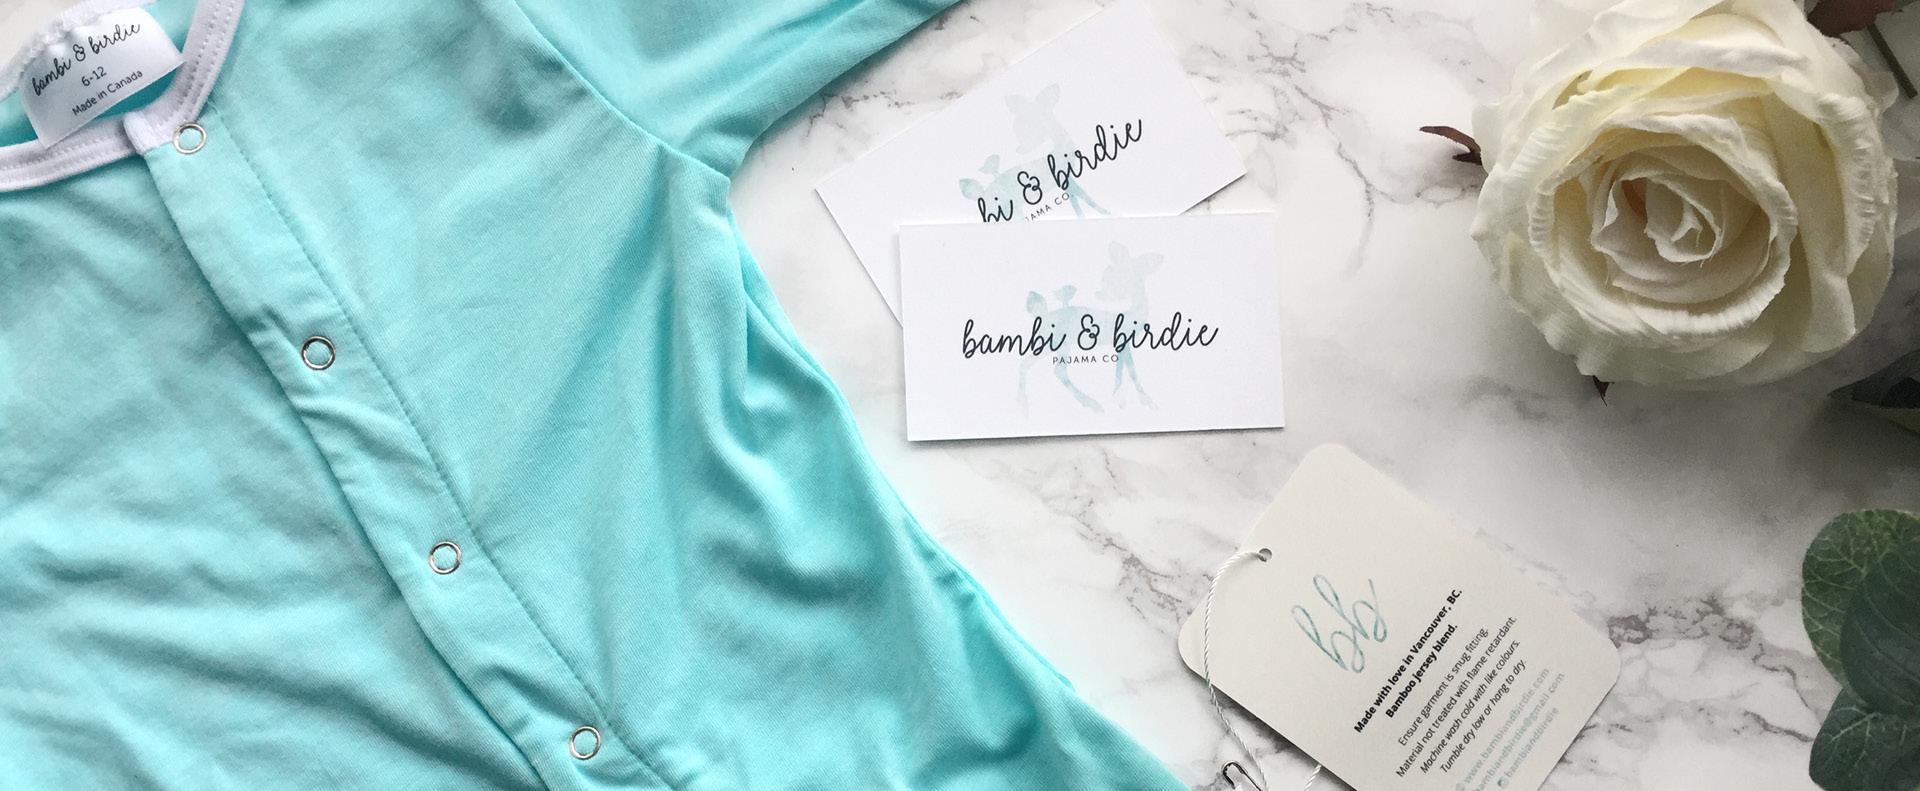 Bambi and Birdie cards and pajamas - White Canvas Design